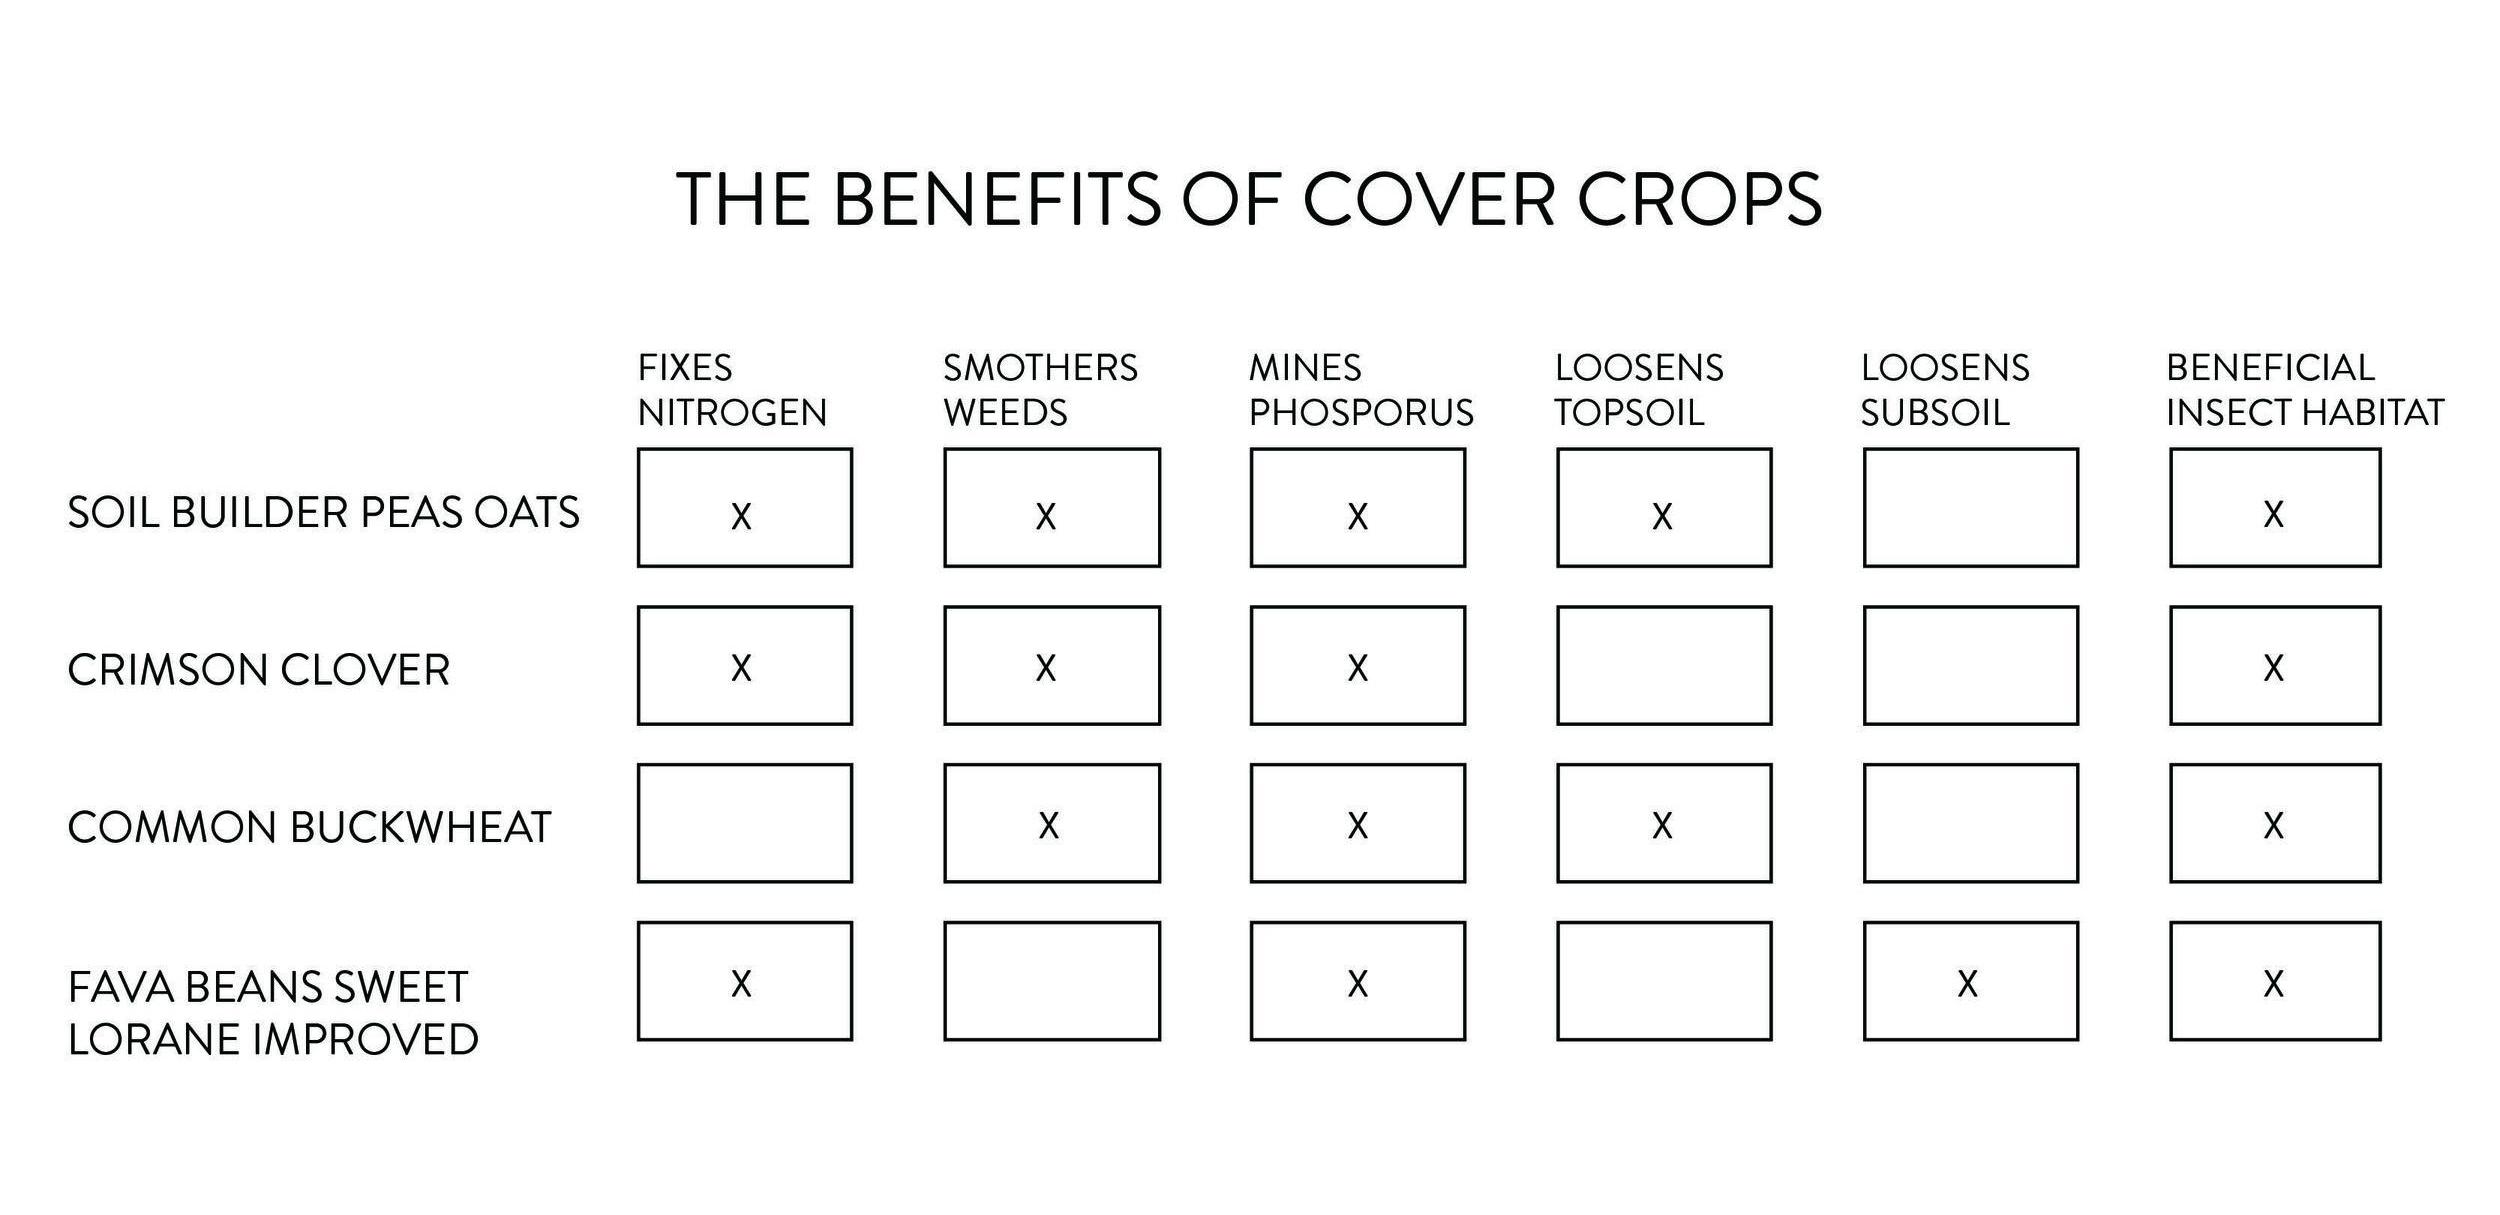 covercrop-benefits.jpg